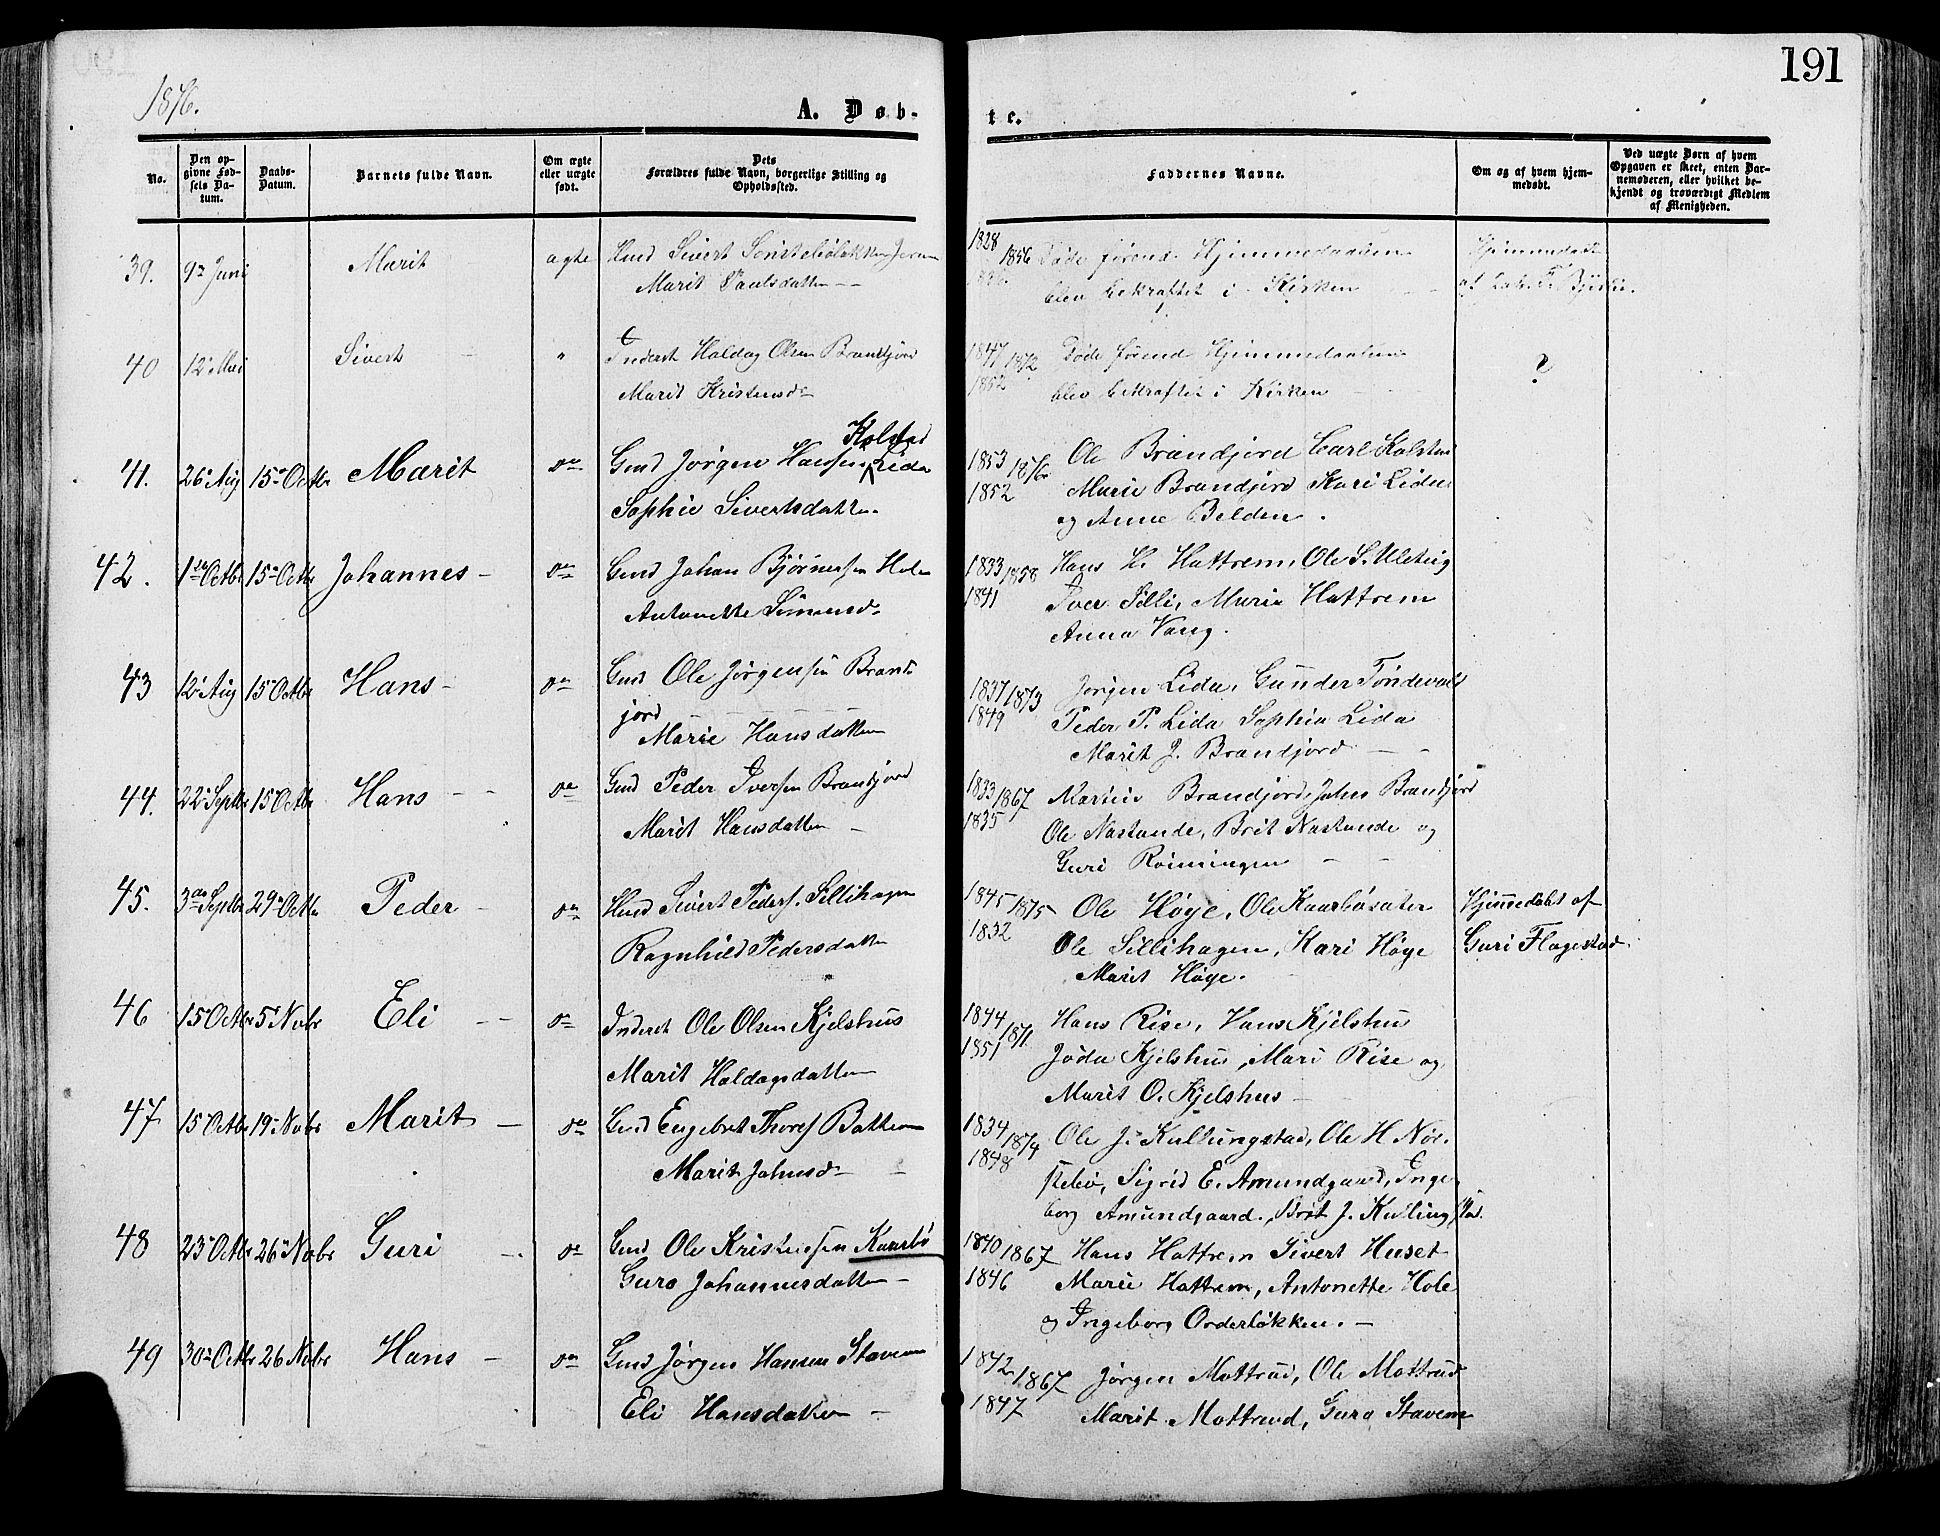 SAH, Lesja prestekontor, Ministerialbok nr. 8, 1854-1880, s. 191